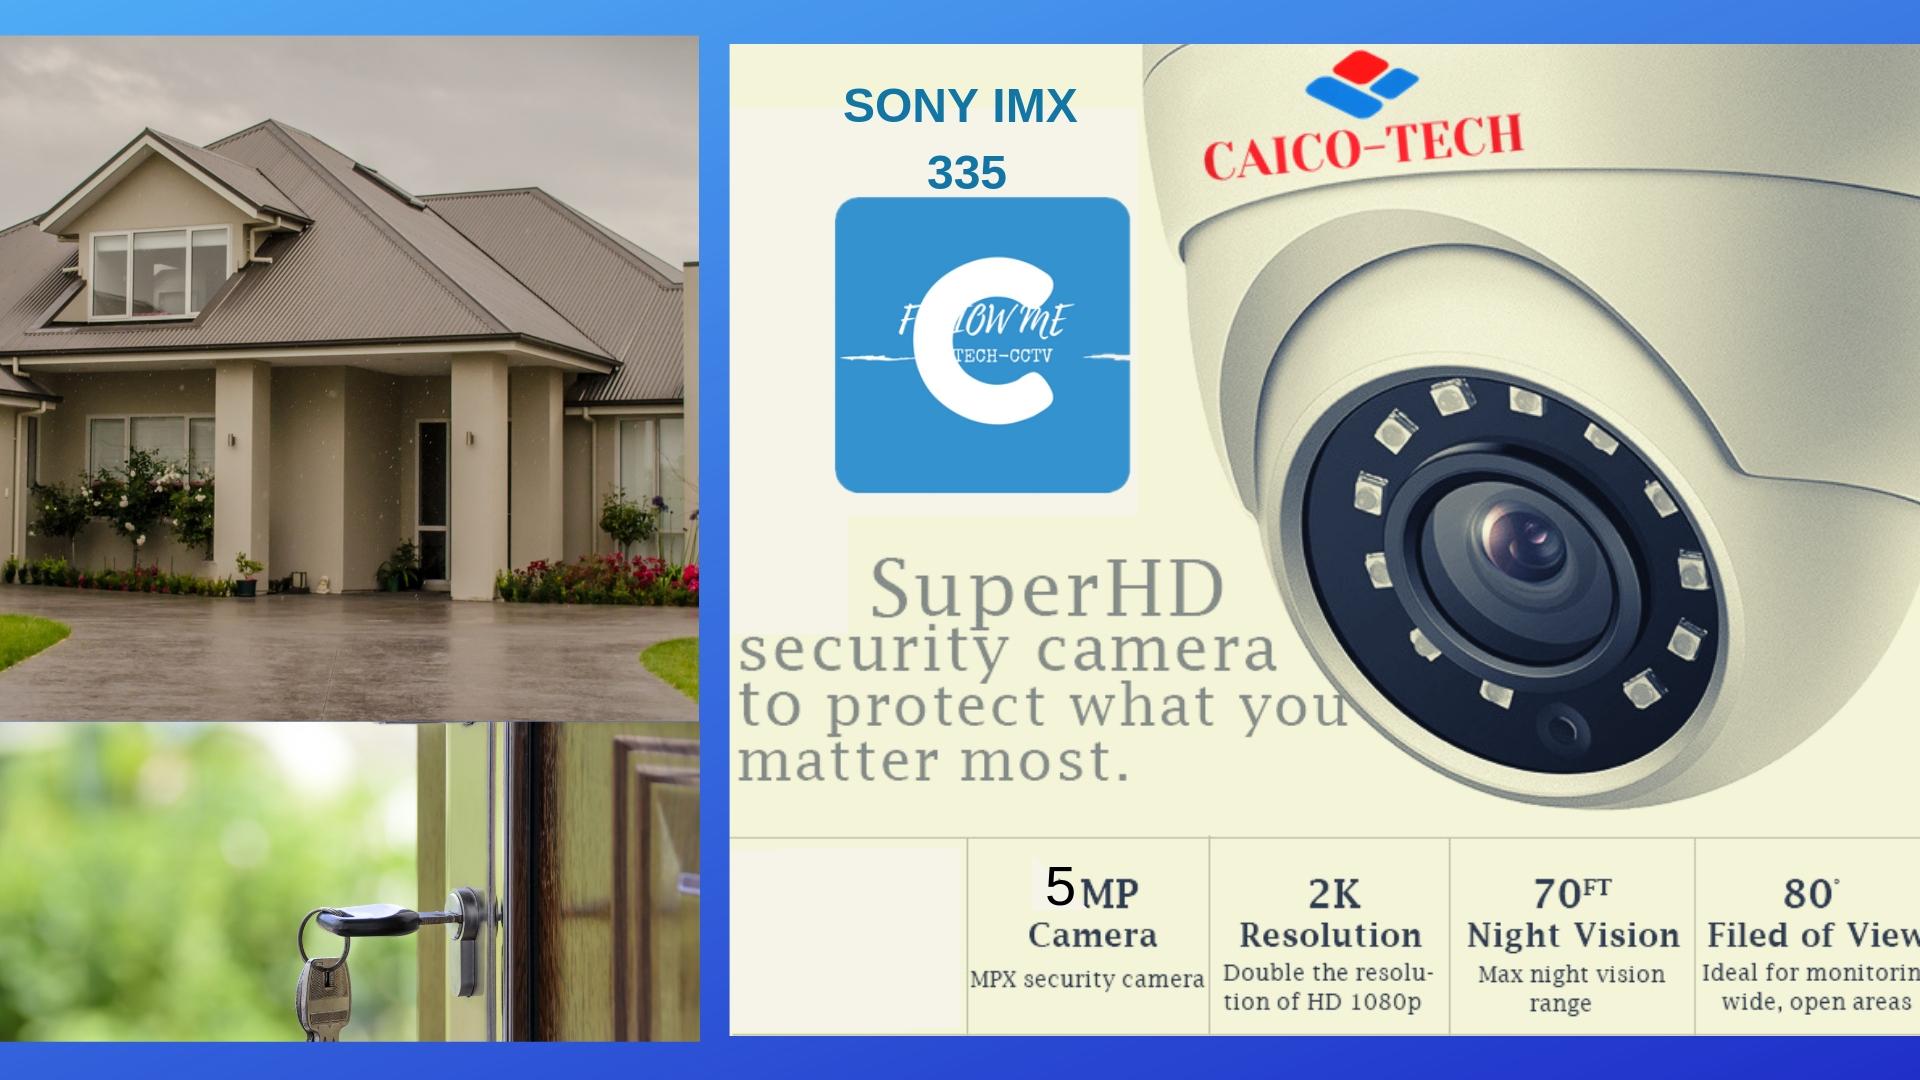 CFAICO TECH CCTV CMOS SONY IMX 335 5Mpix